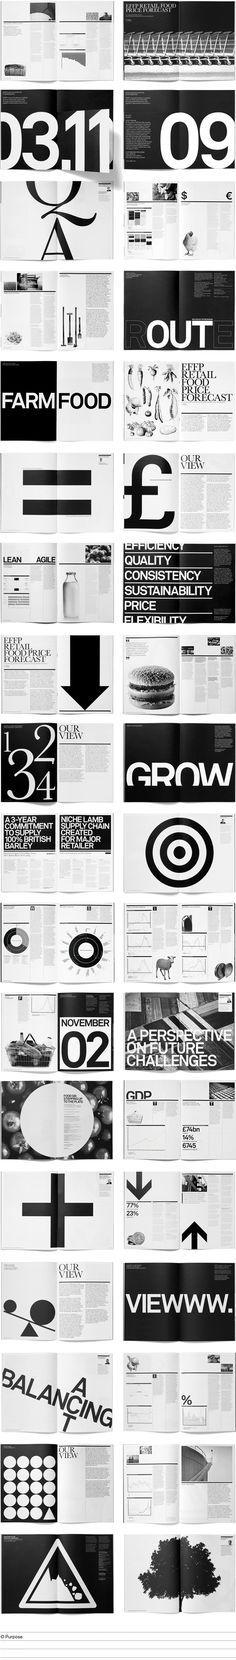 Outstanding work! - EFFP View Magazine   Designer: Paul Felton Design